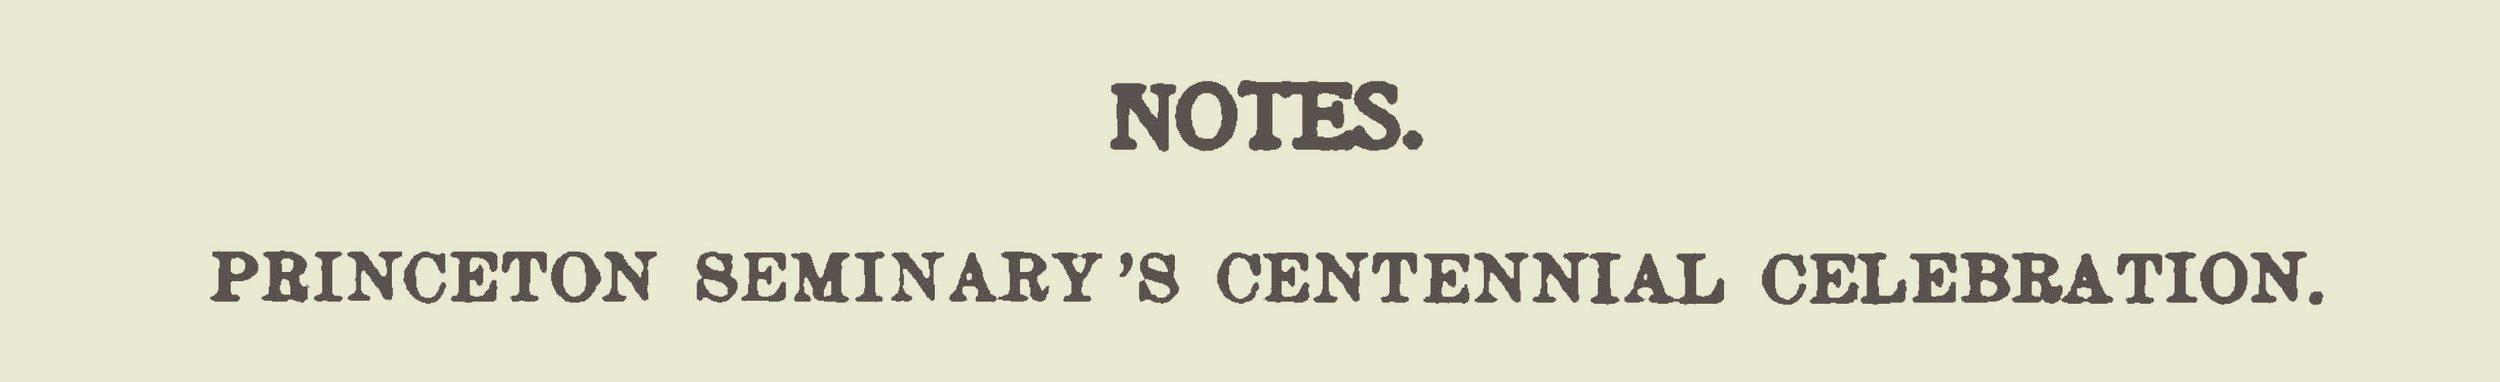 Warfield, Benjamin Breckinridge, Notes on Princeton Seminary Centennial Celebration Title Page.jpg